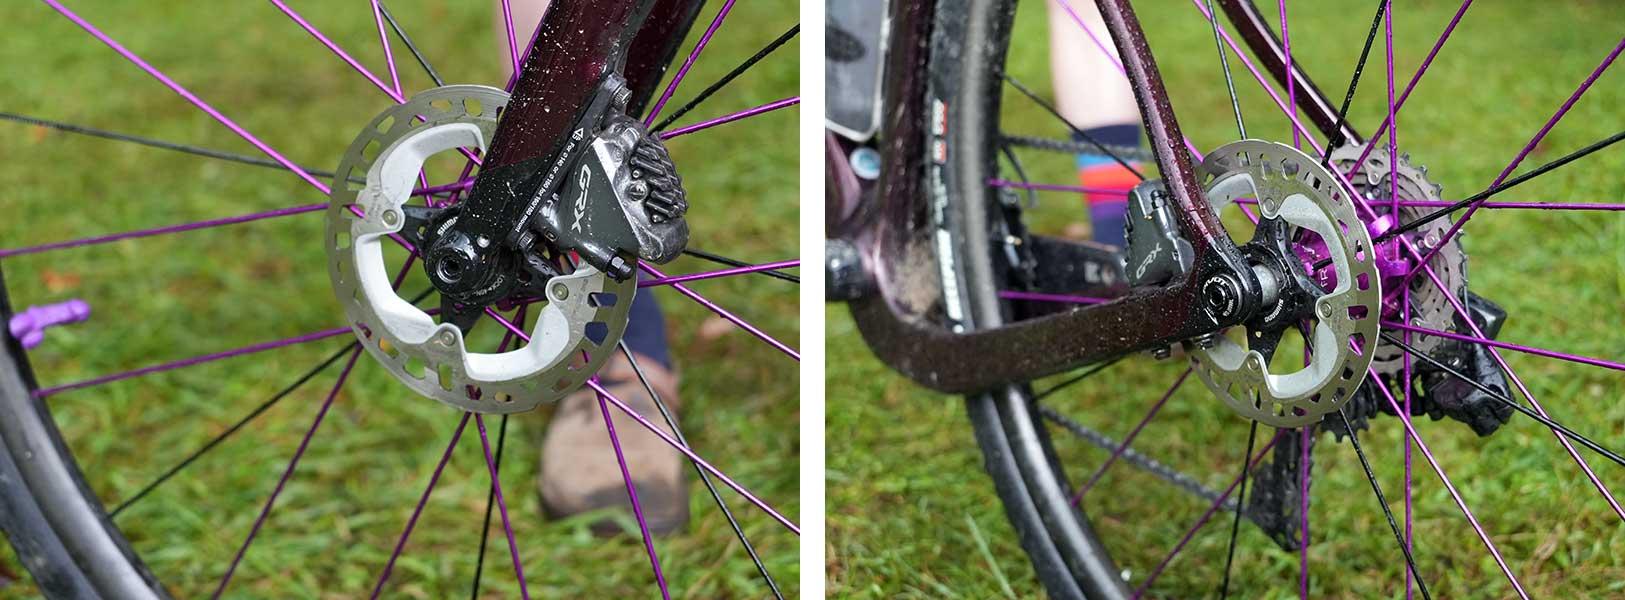 industry nine hubs and wheels on gordon wadsworth's pivot vault gravel race bike